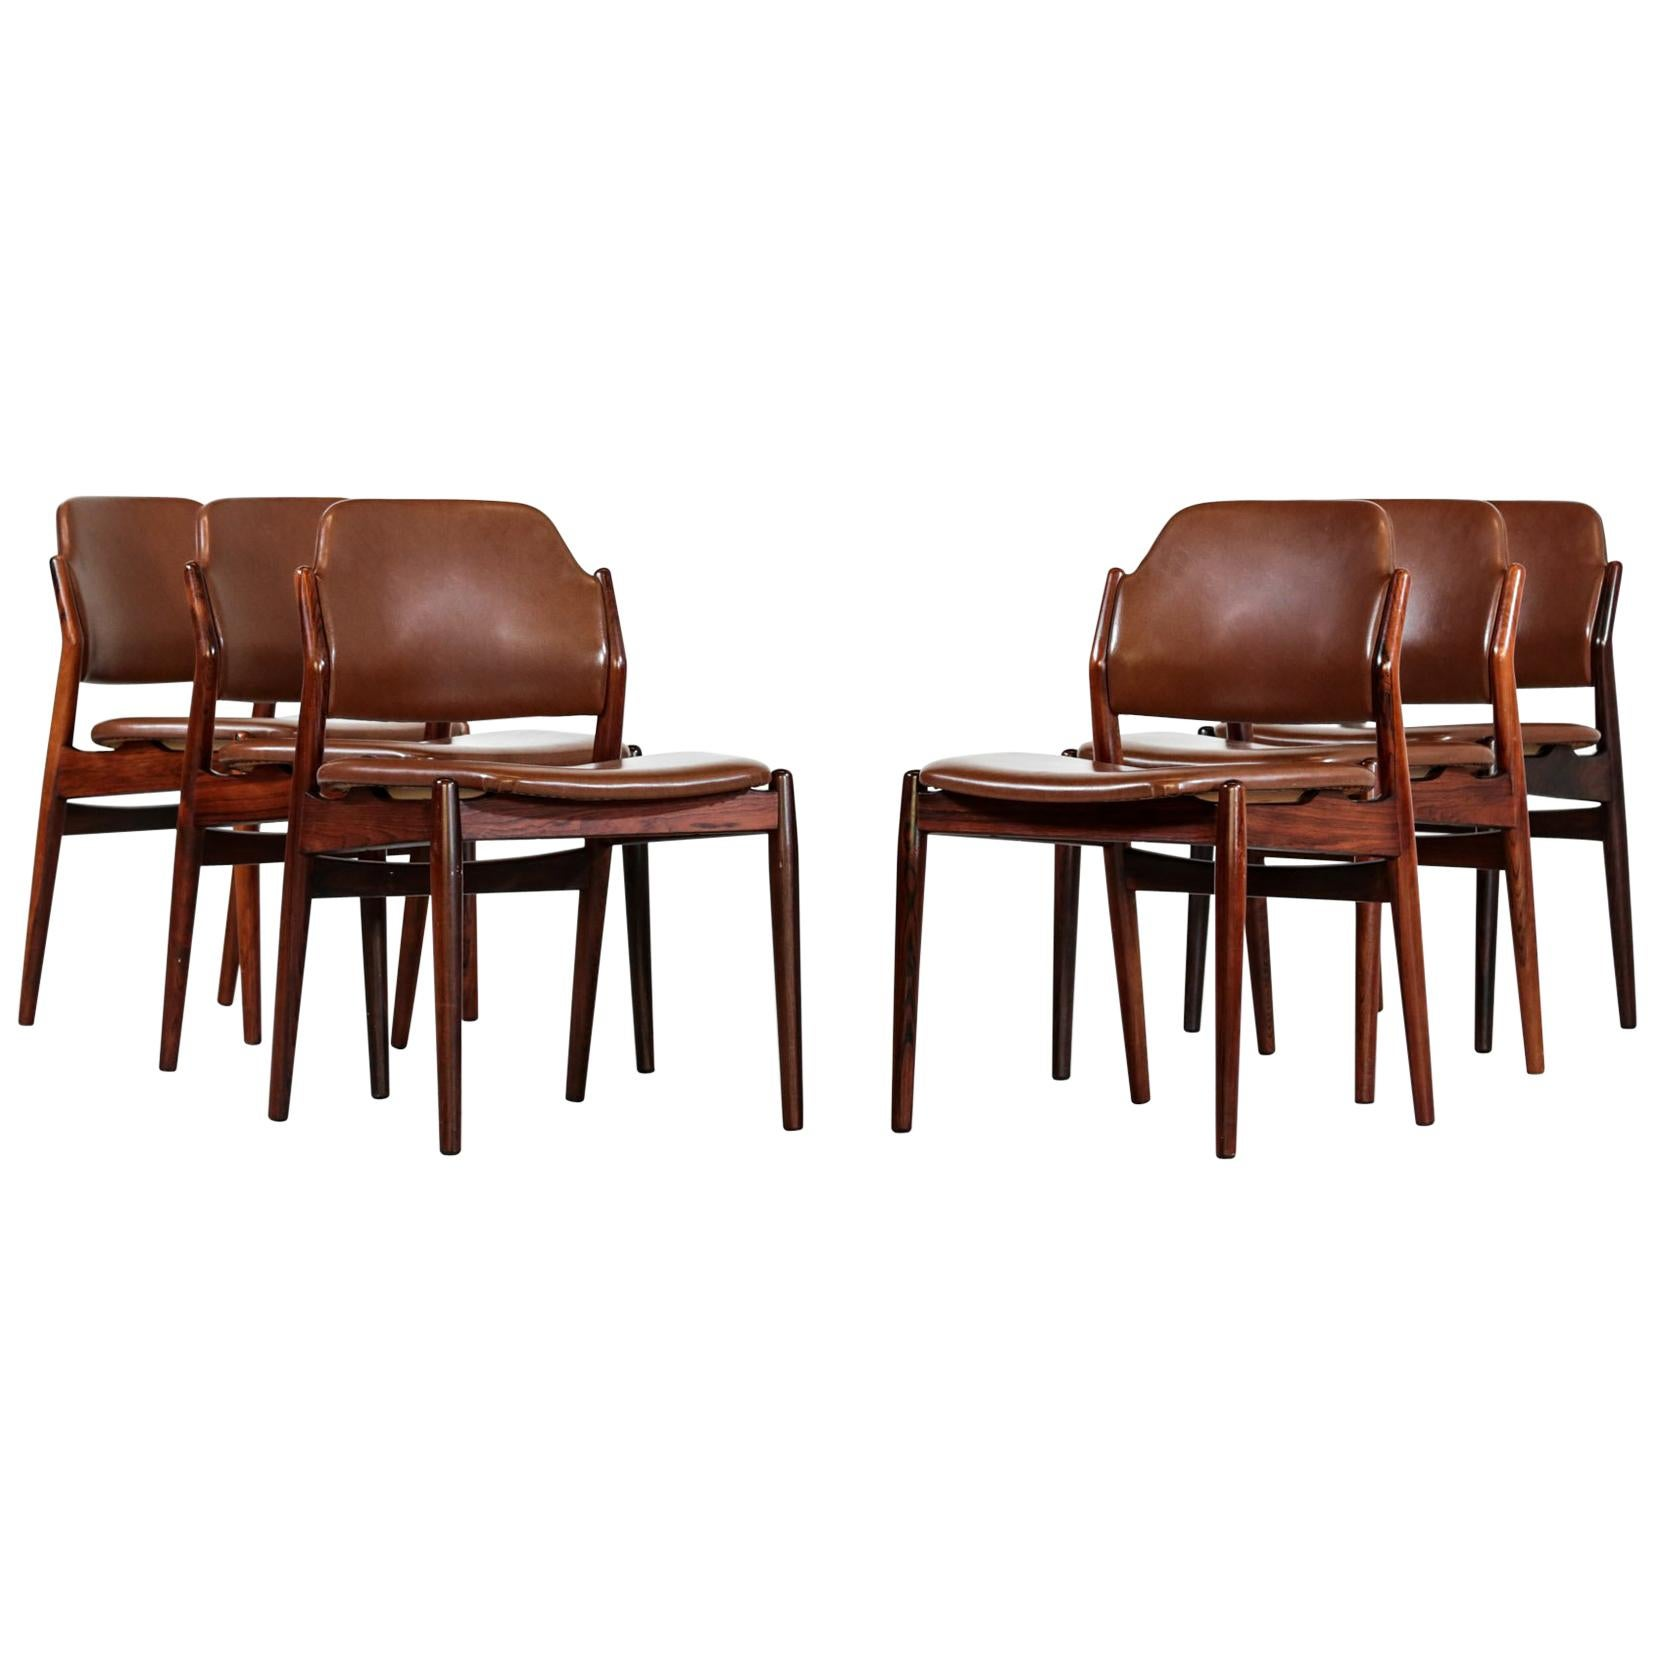 Arne Vodder Chairs, Set of 6 in Rosewood, Denmark